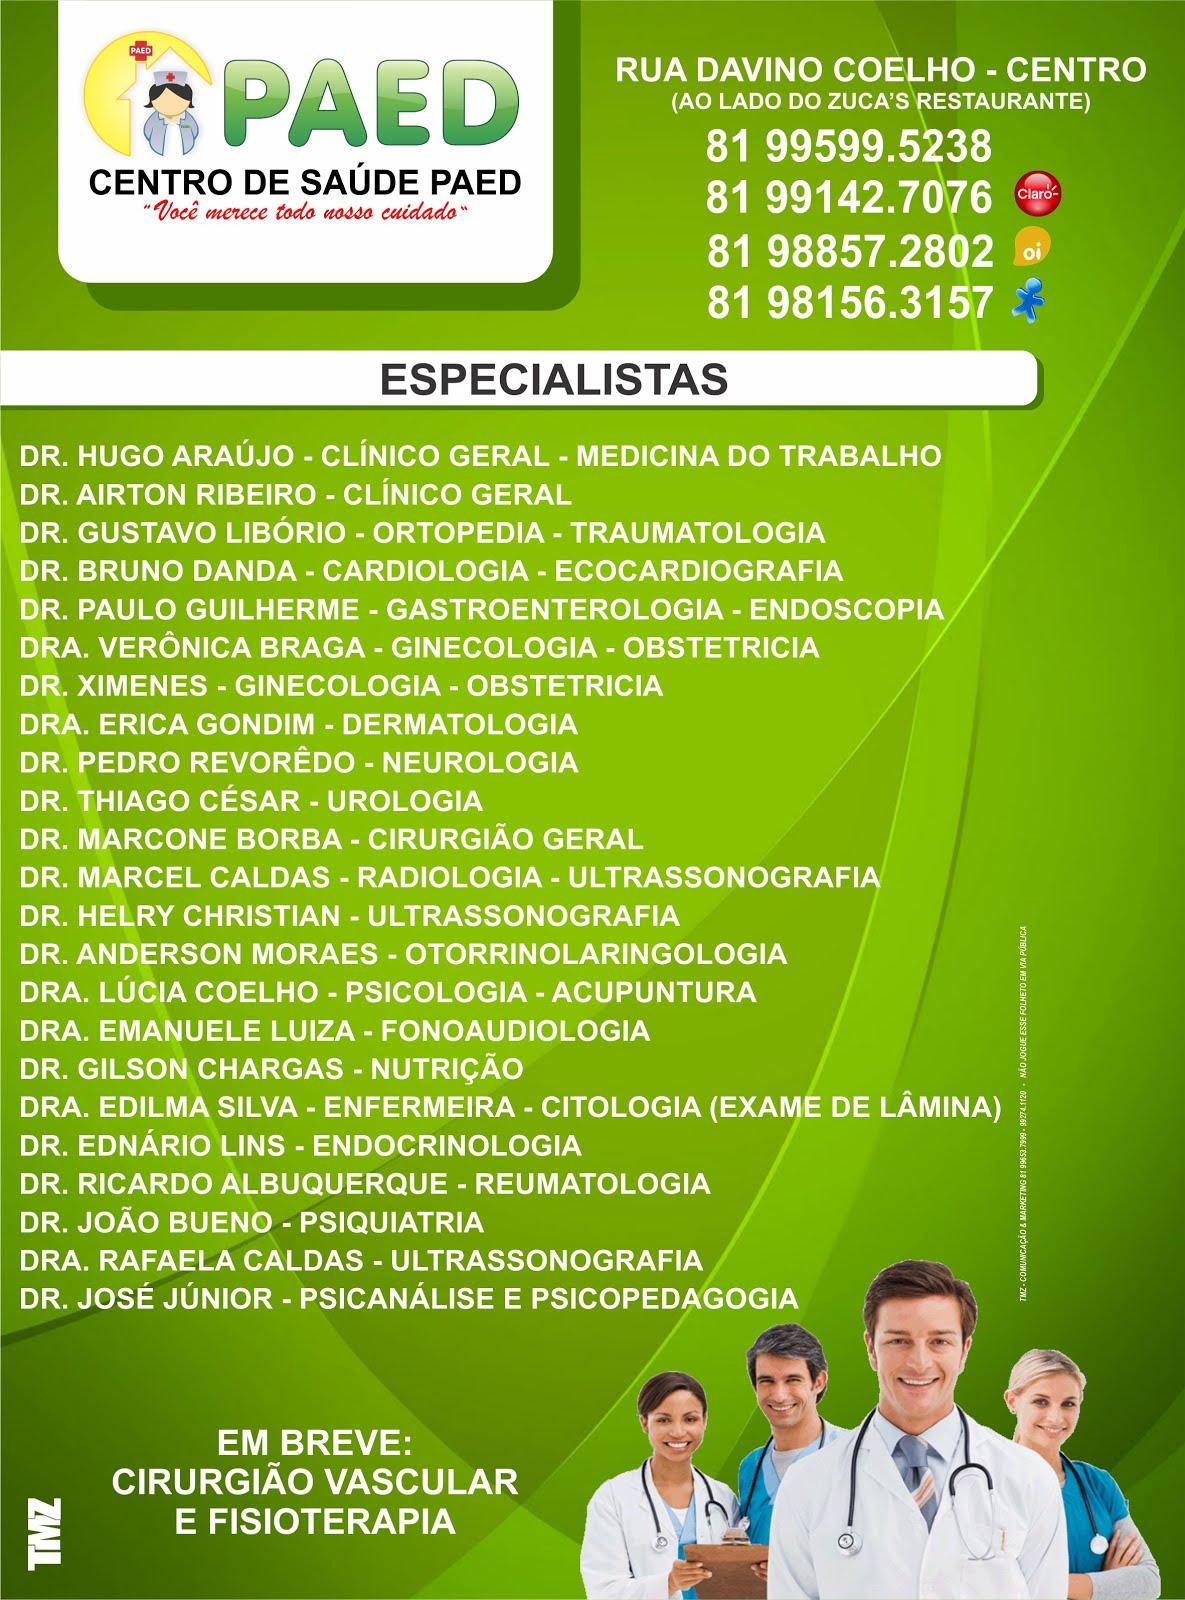 Publicidade - Centro de Saúde PAED